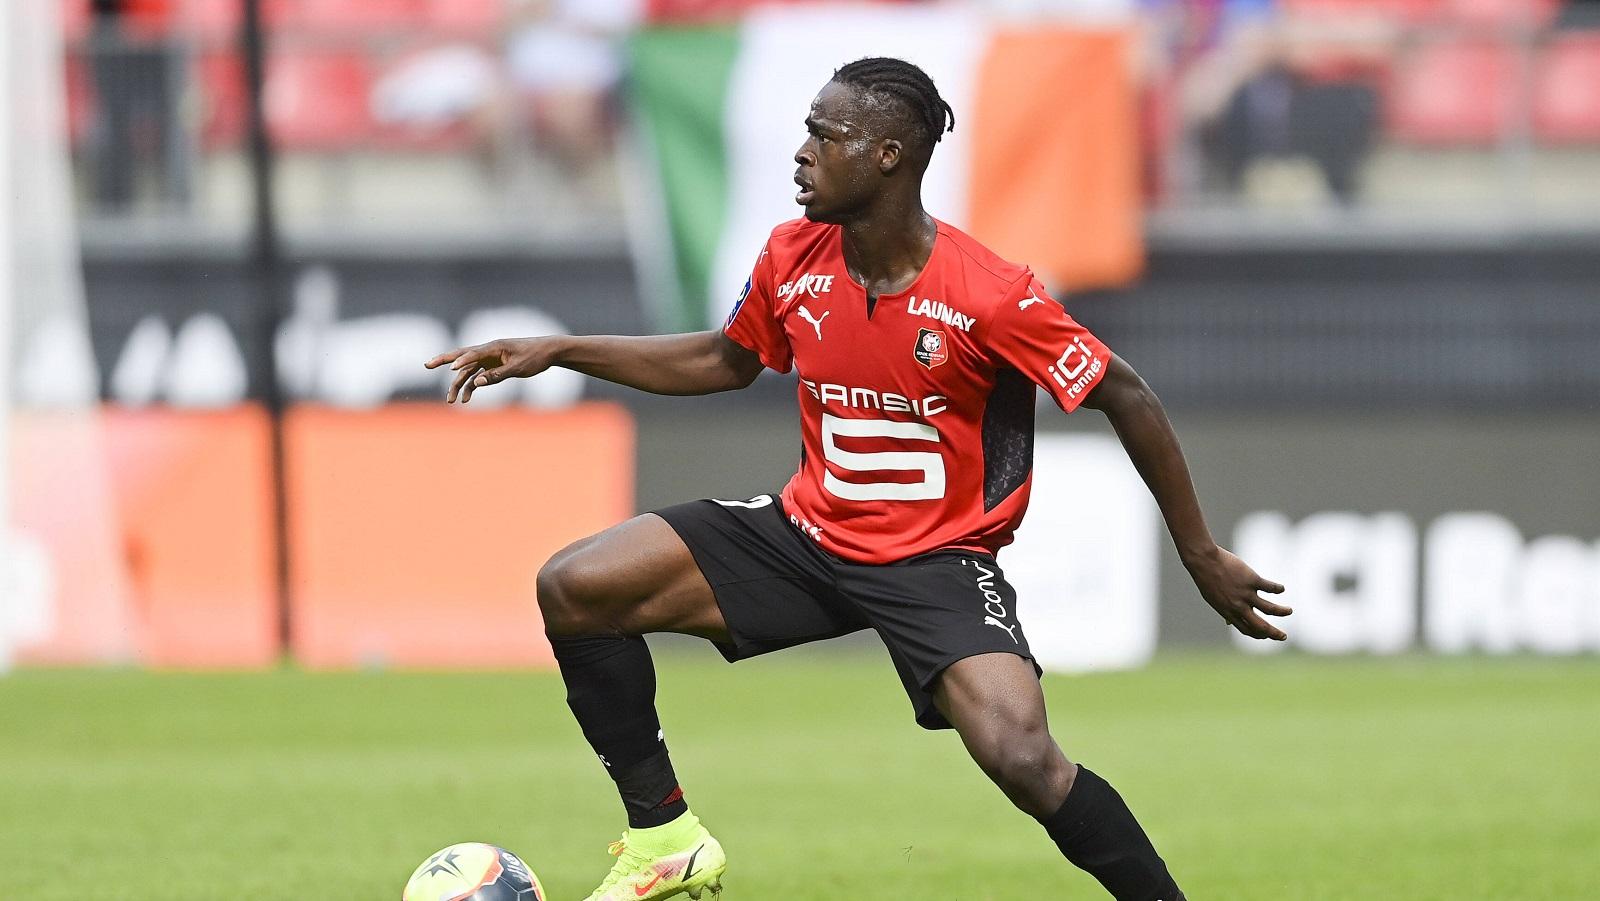 Ghana star Kamaldeen Sulemana named in best eleven summer signings of 21/22